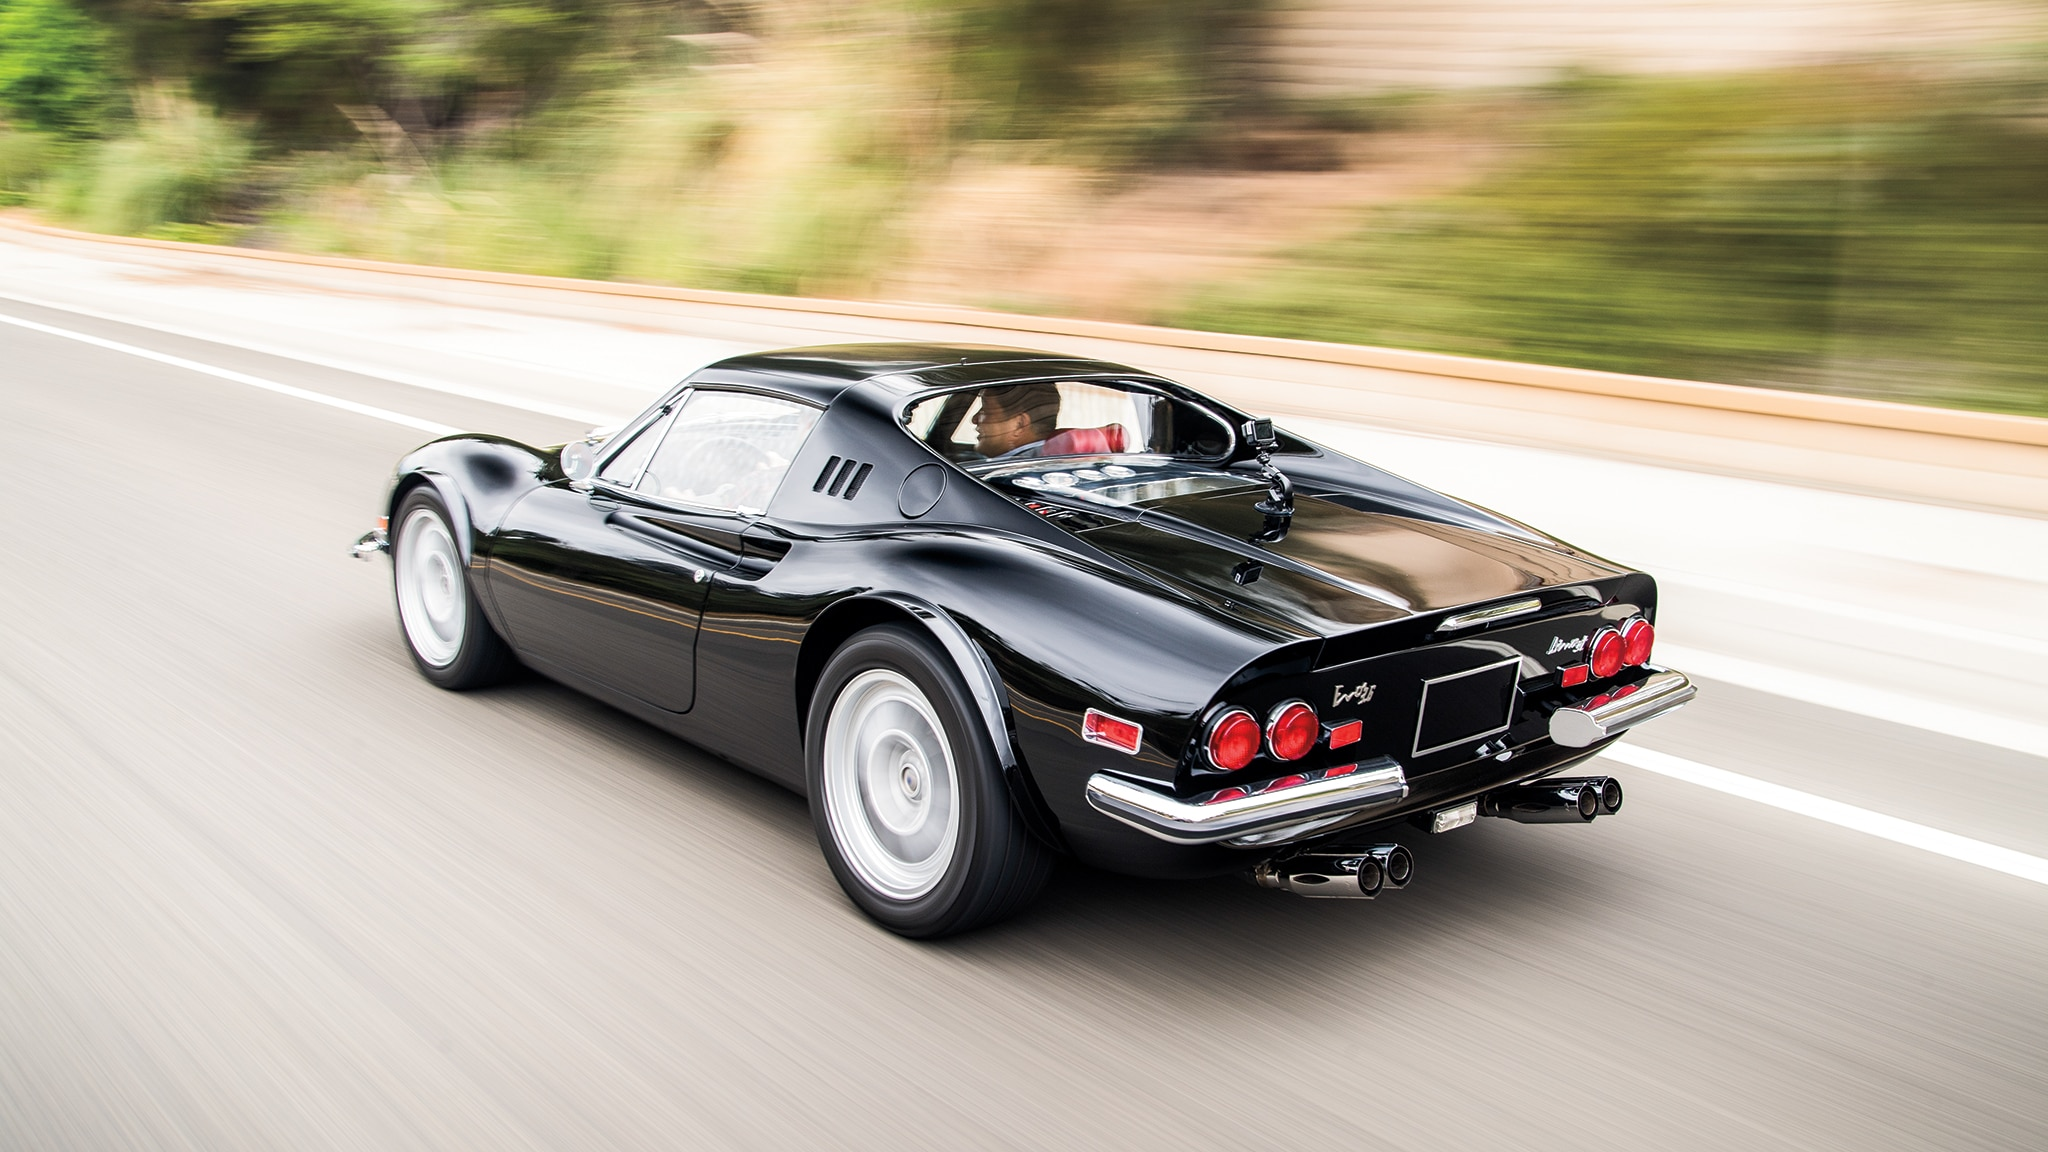 We Drive The 1 Million Plus Outlaw Ferrari Dino Monza 3 6 Evo